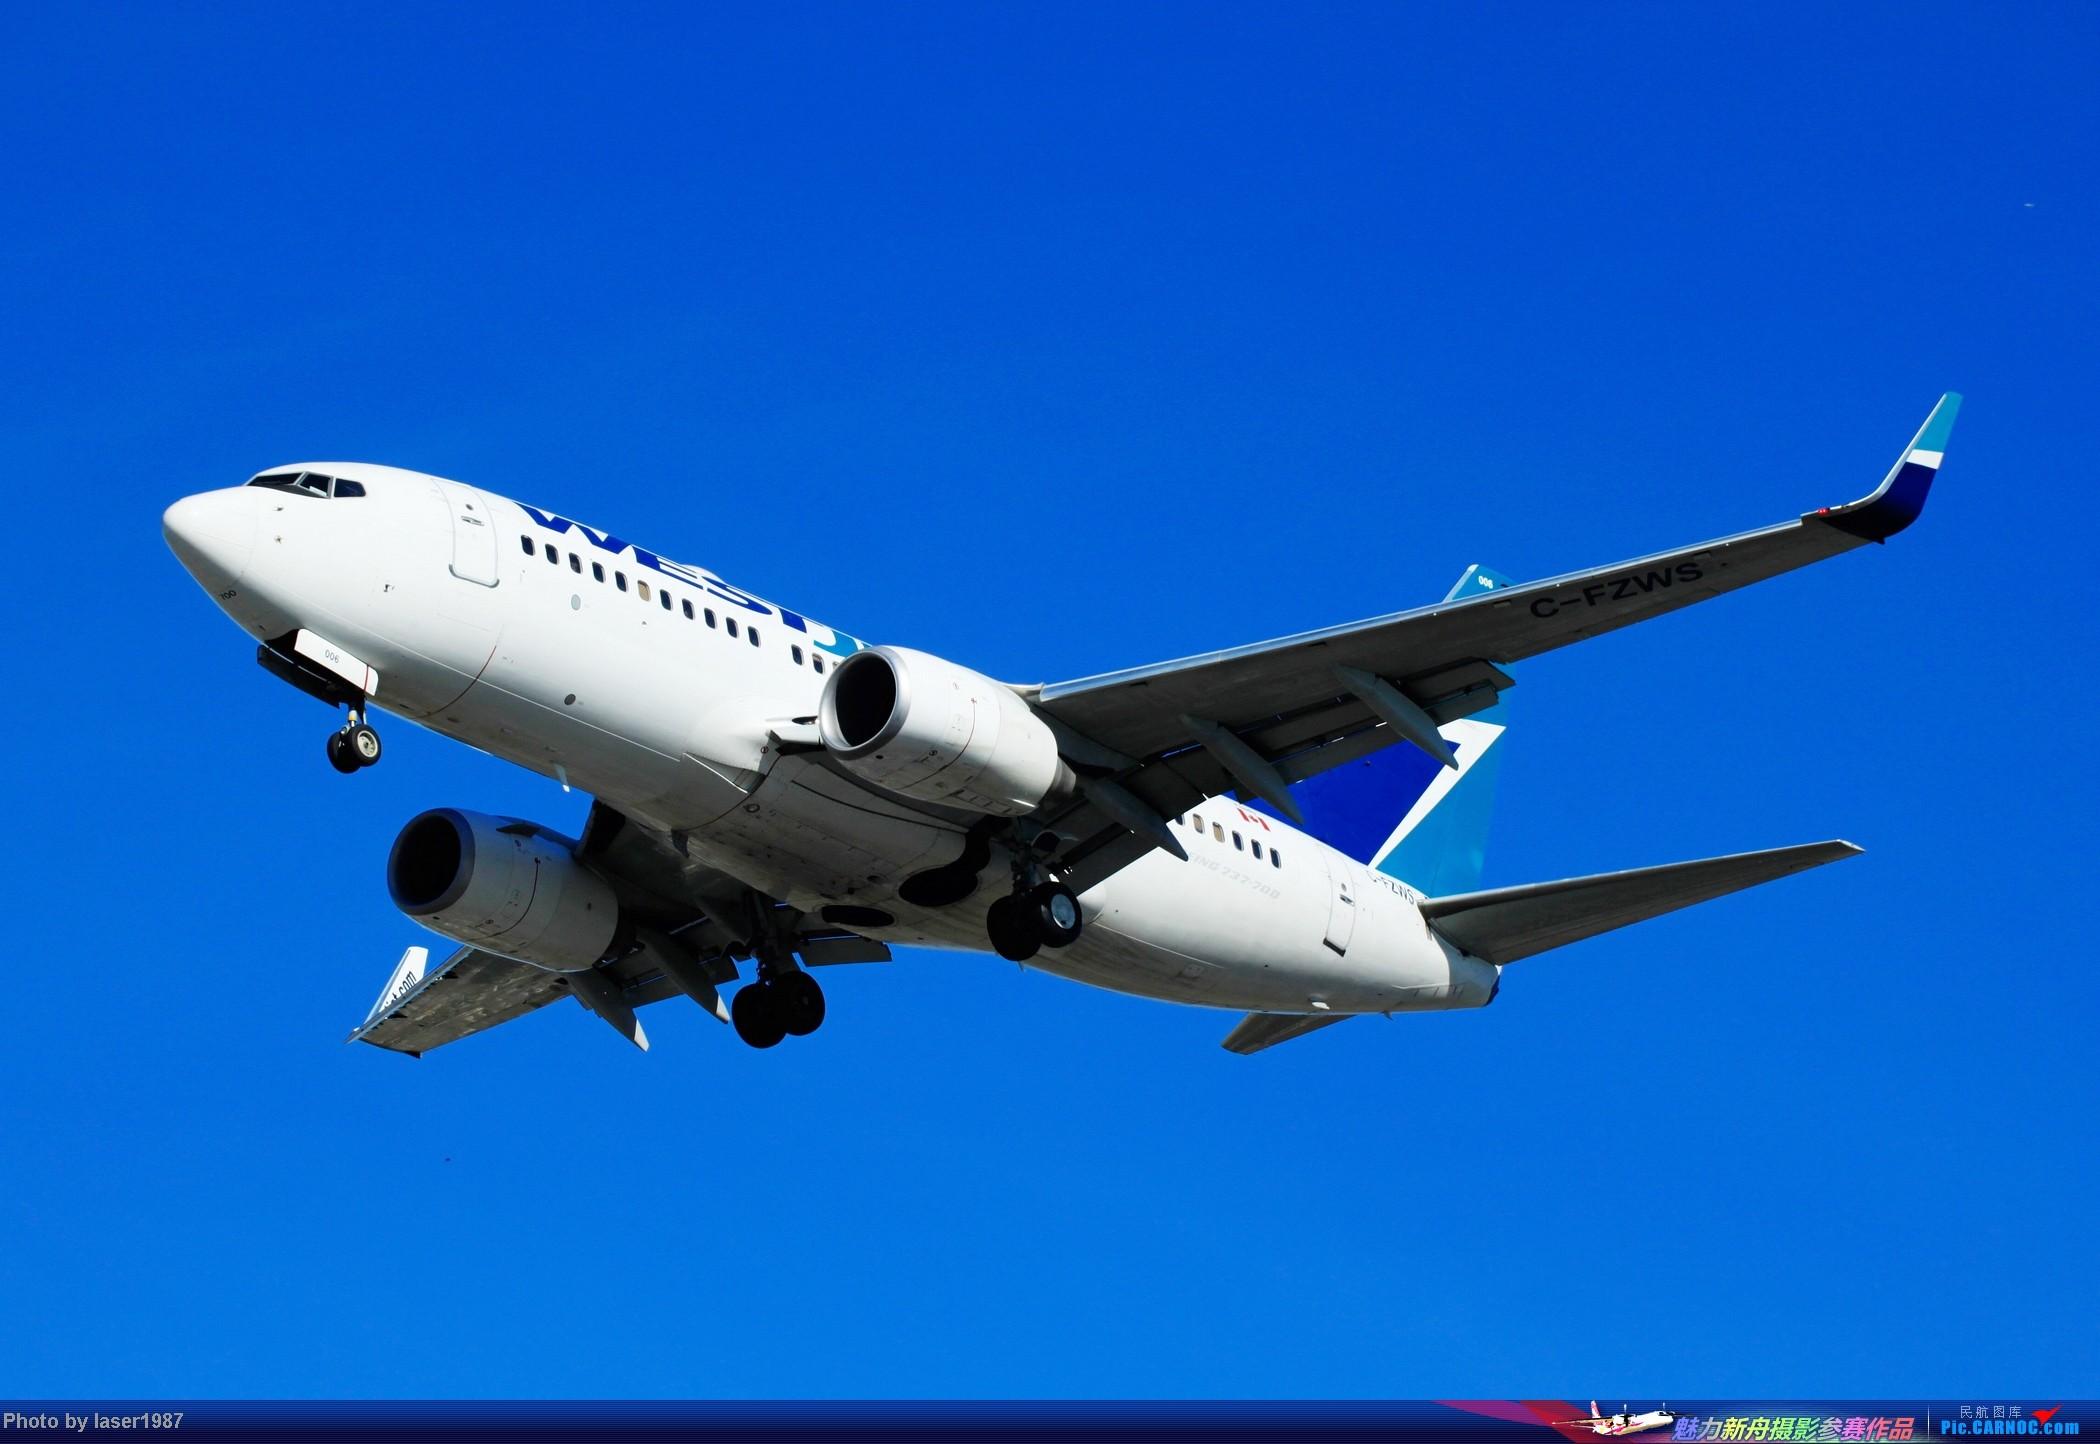 Re:[原创]2011.12.25 LAX 24R跑道东侧停车场拍飞机 BOEING 737-700 C-FZWS 美国洛杉矶国际机场